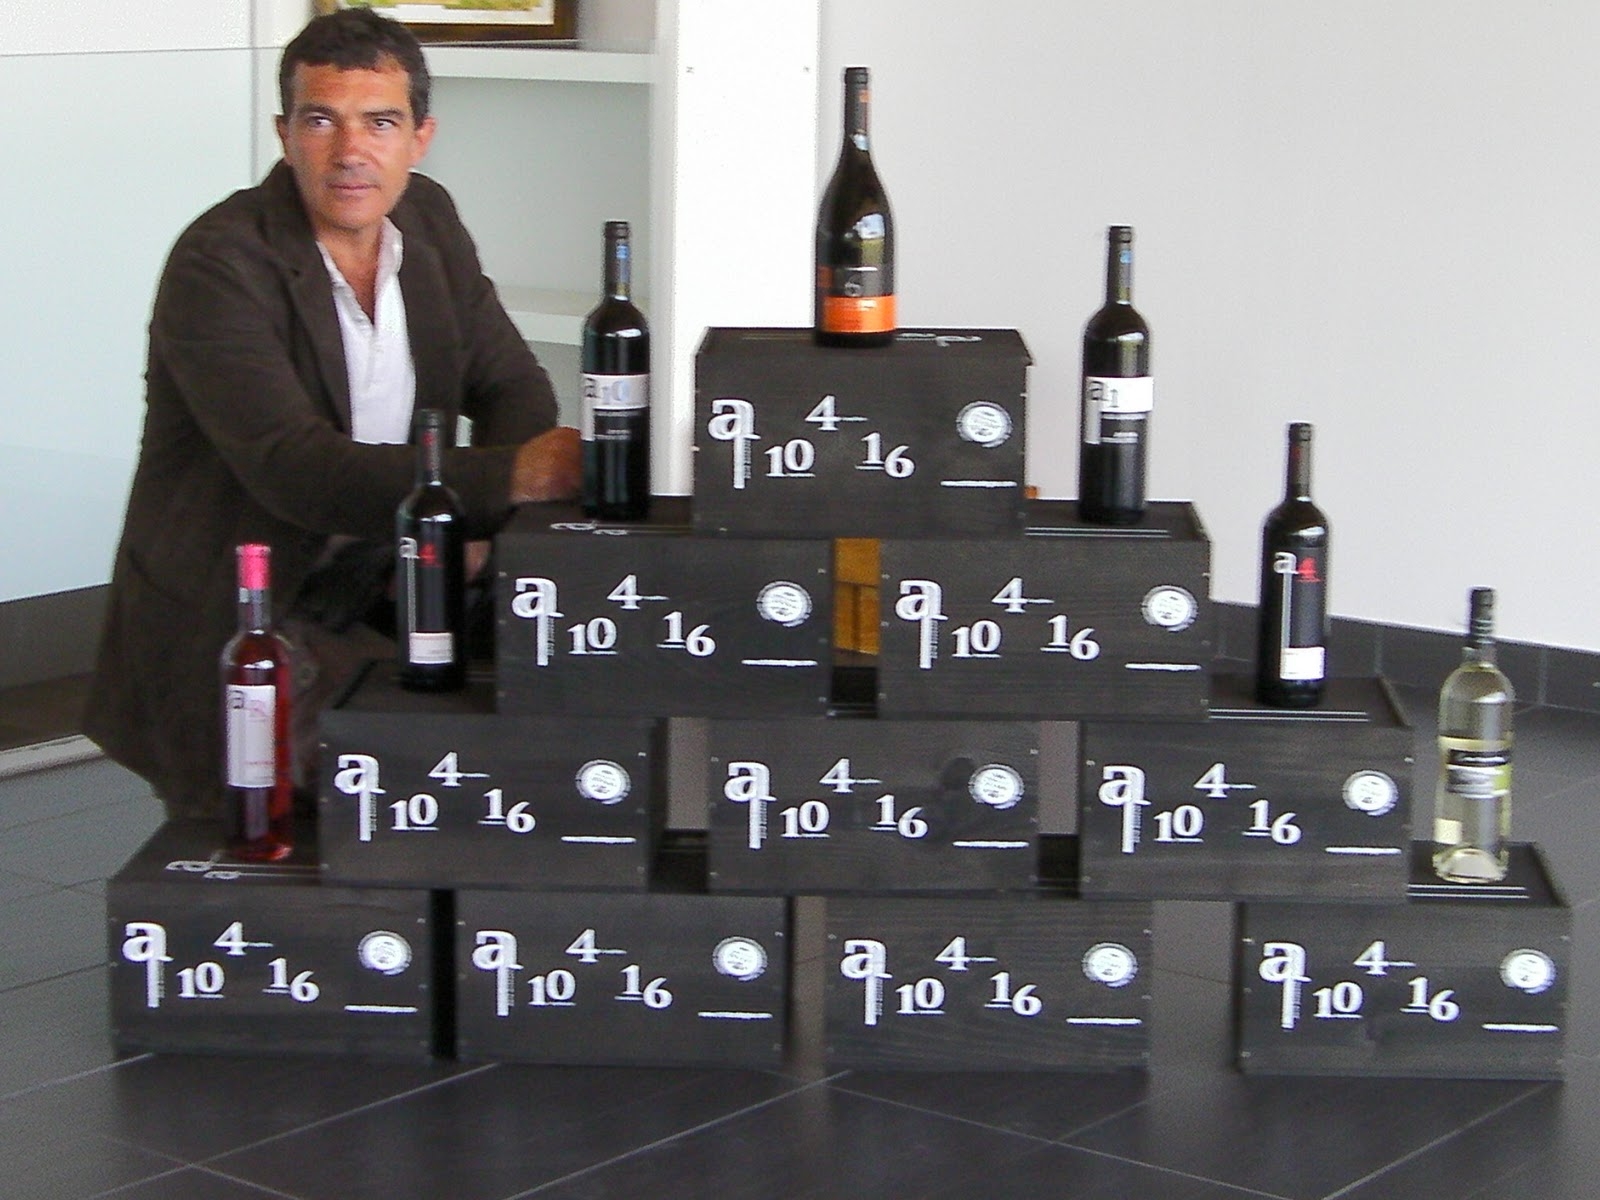 http://3.bp.blogspot.com/_iuCXeFKfFtc/TE4y2YfzGVI/AAAAAAAAAwU/boMcrSWWqXA/s1600/ANTA_BANDERAS_S_L_-winery4.jpg